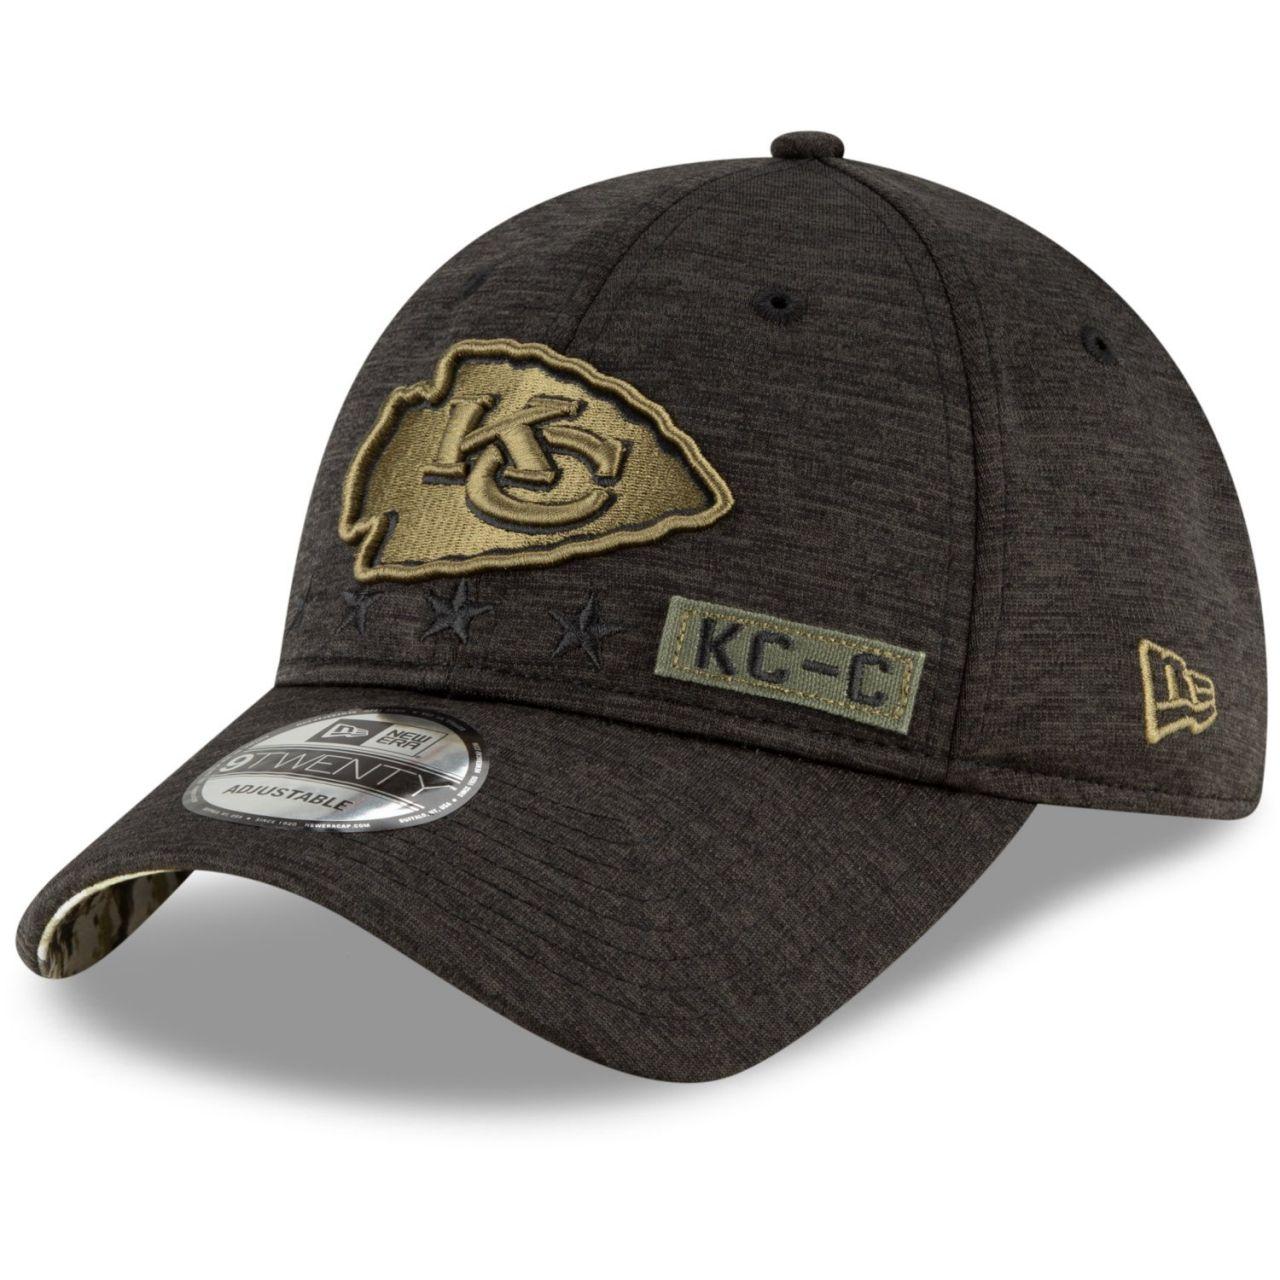 amfoo - New Era 9TWENTY Cap Salute to Service Kansas City Chiefs